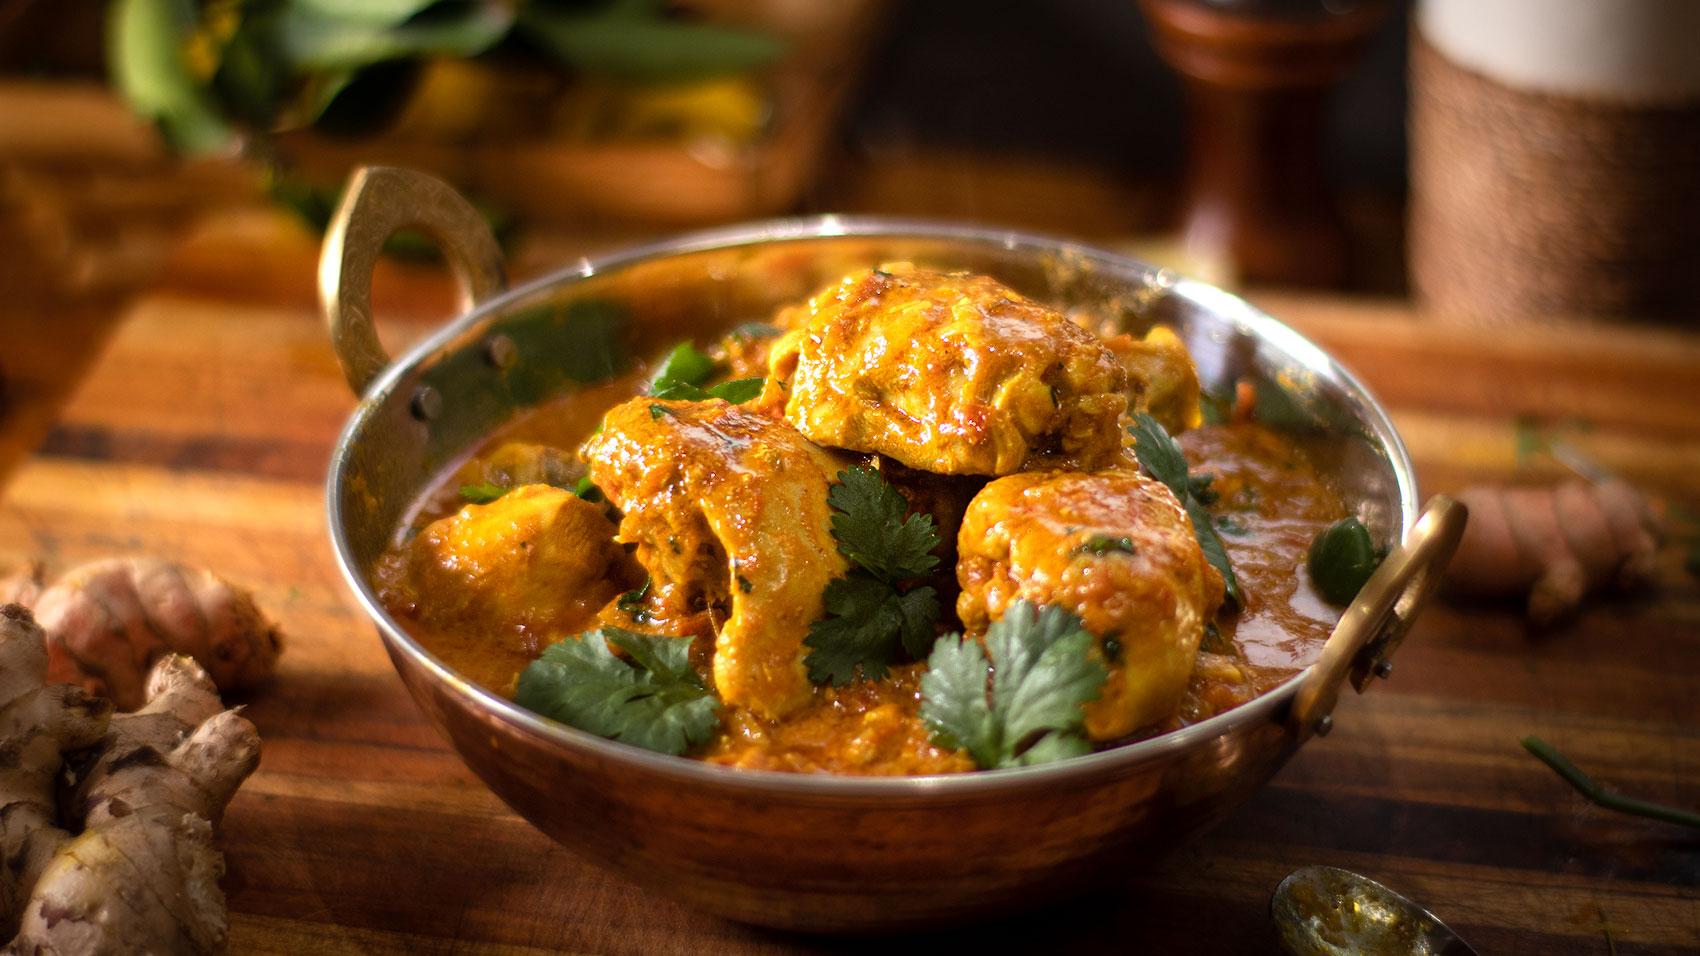 Indian Chicken Curry - Murgh Kari